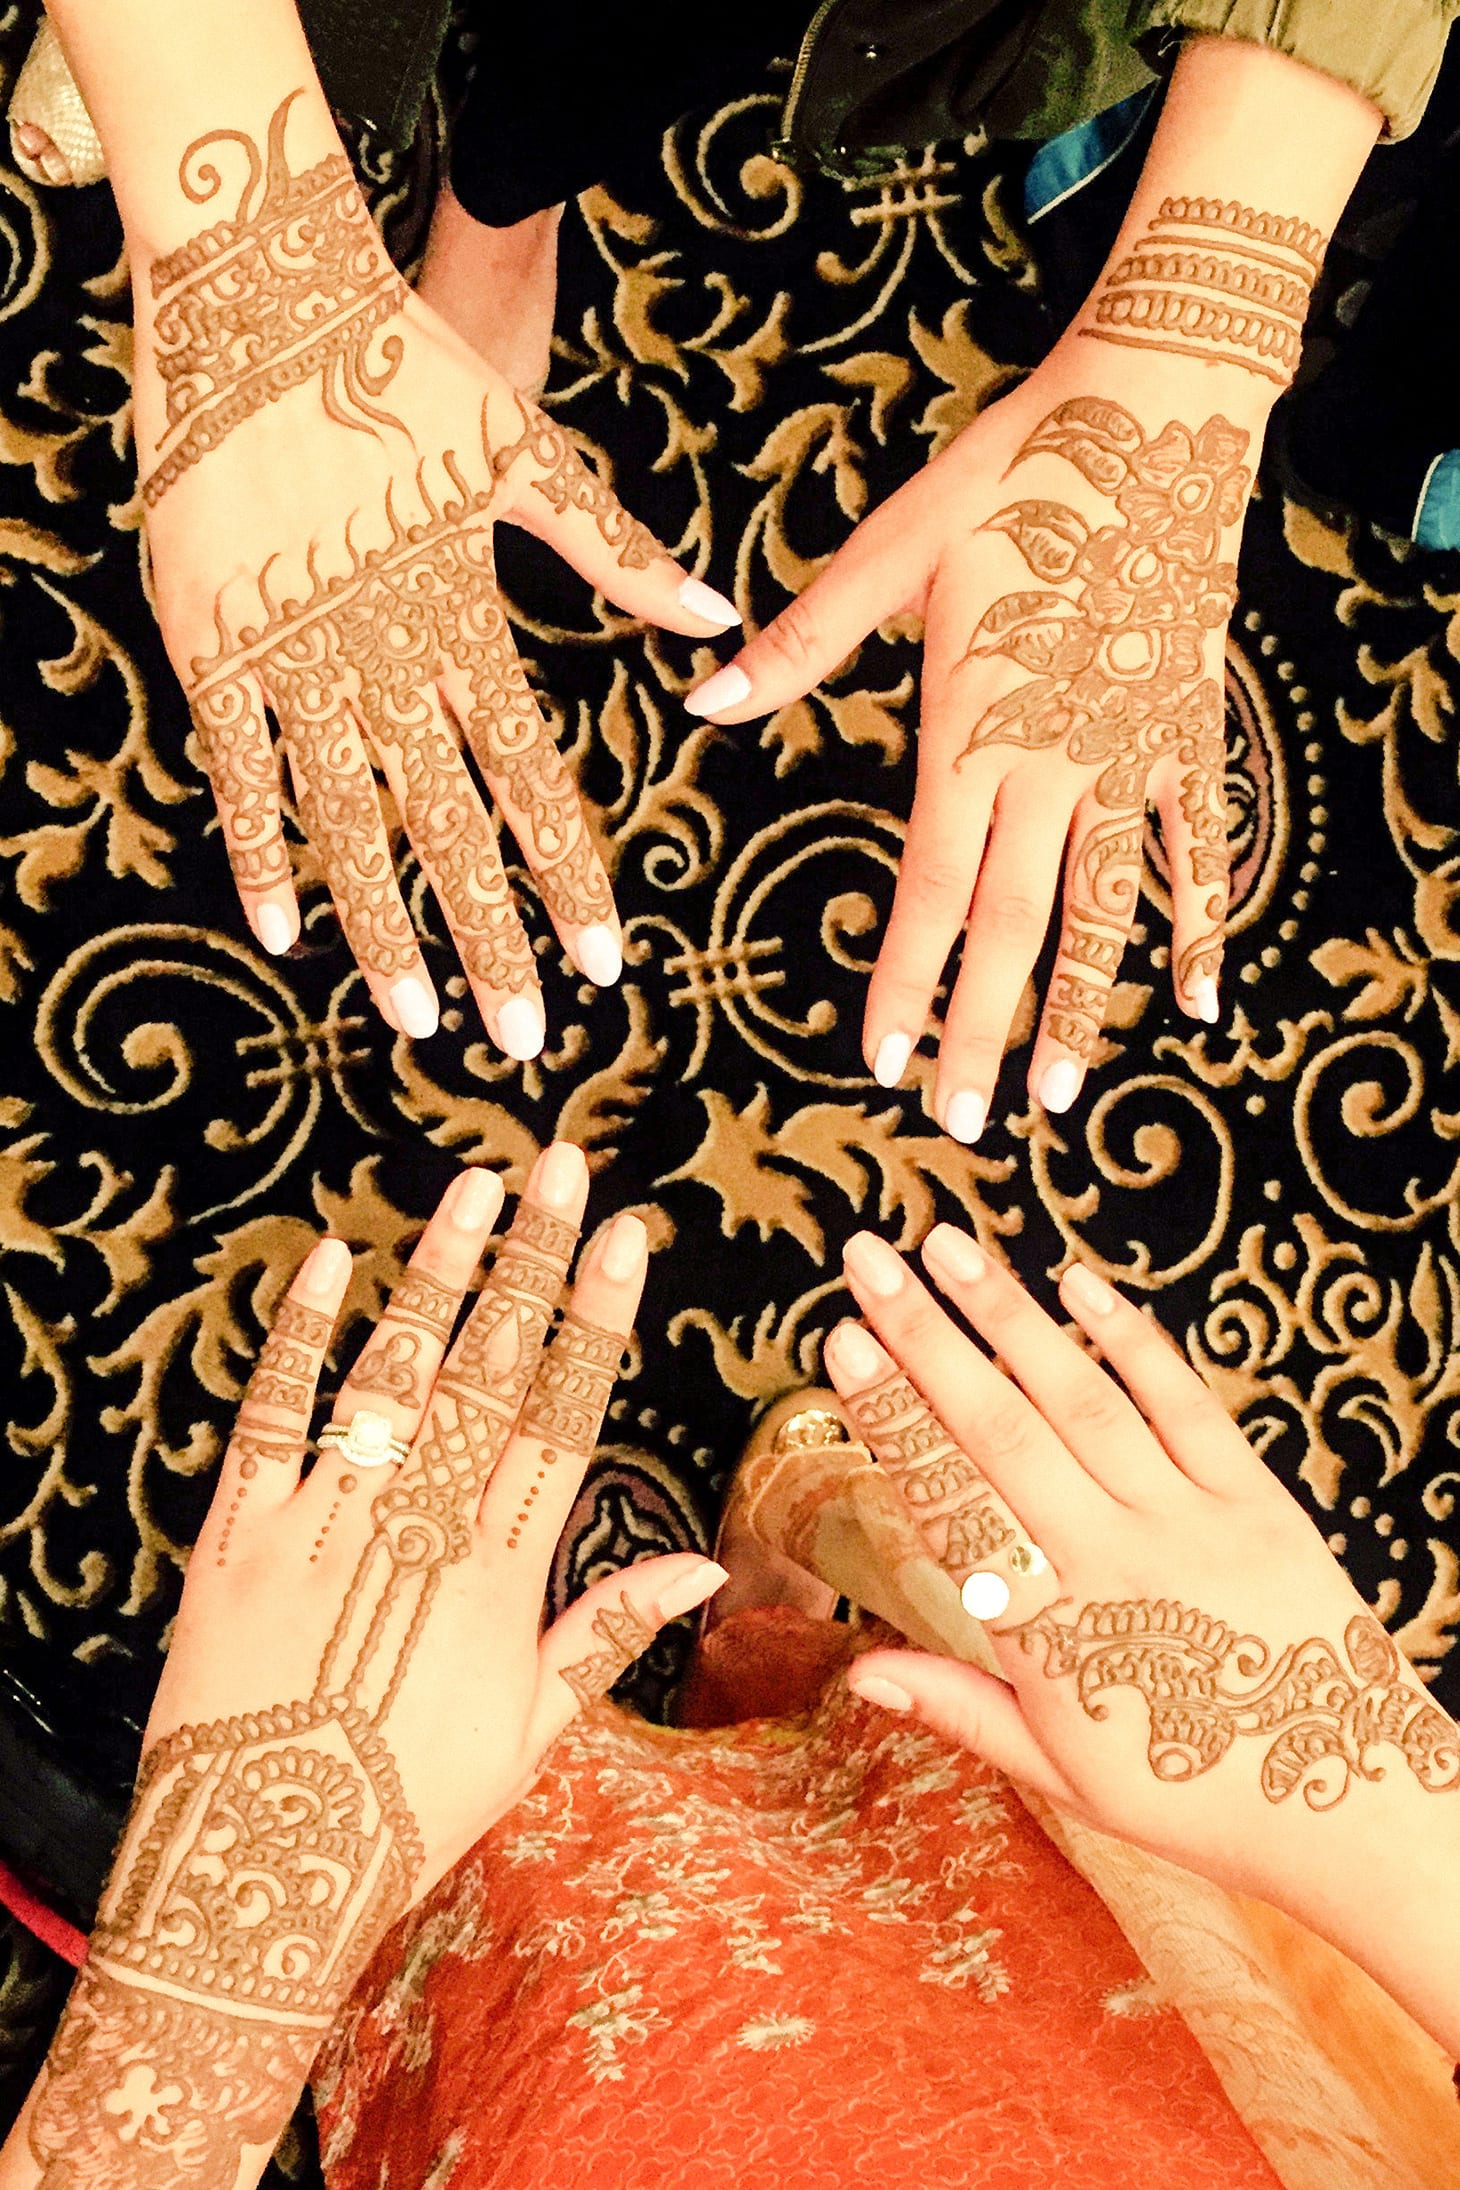 Henna Tattoo on a 2 womens hands.